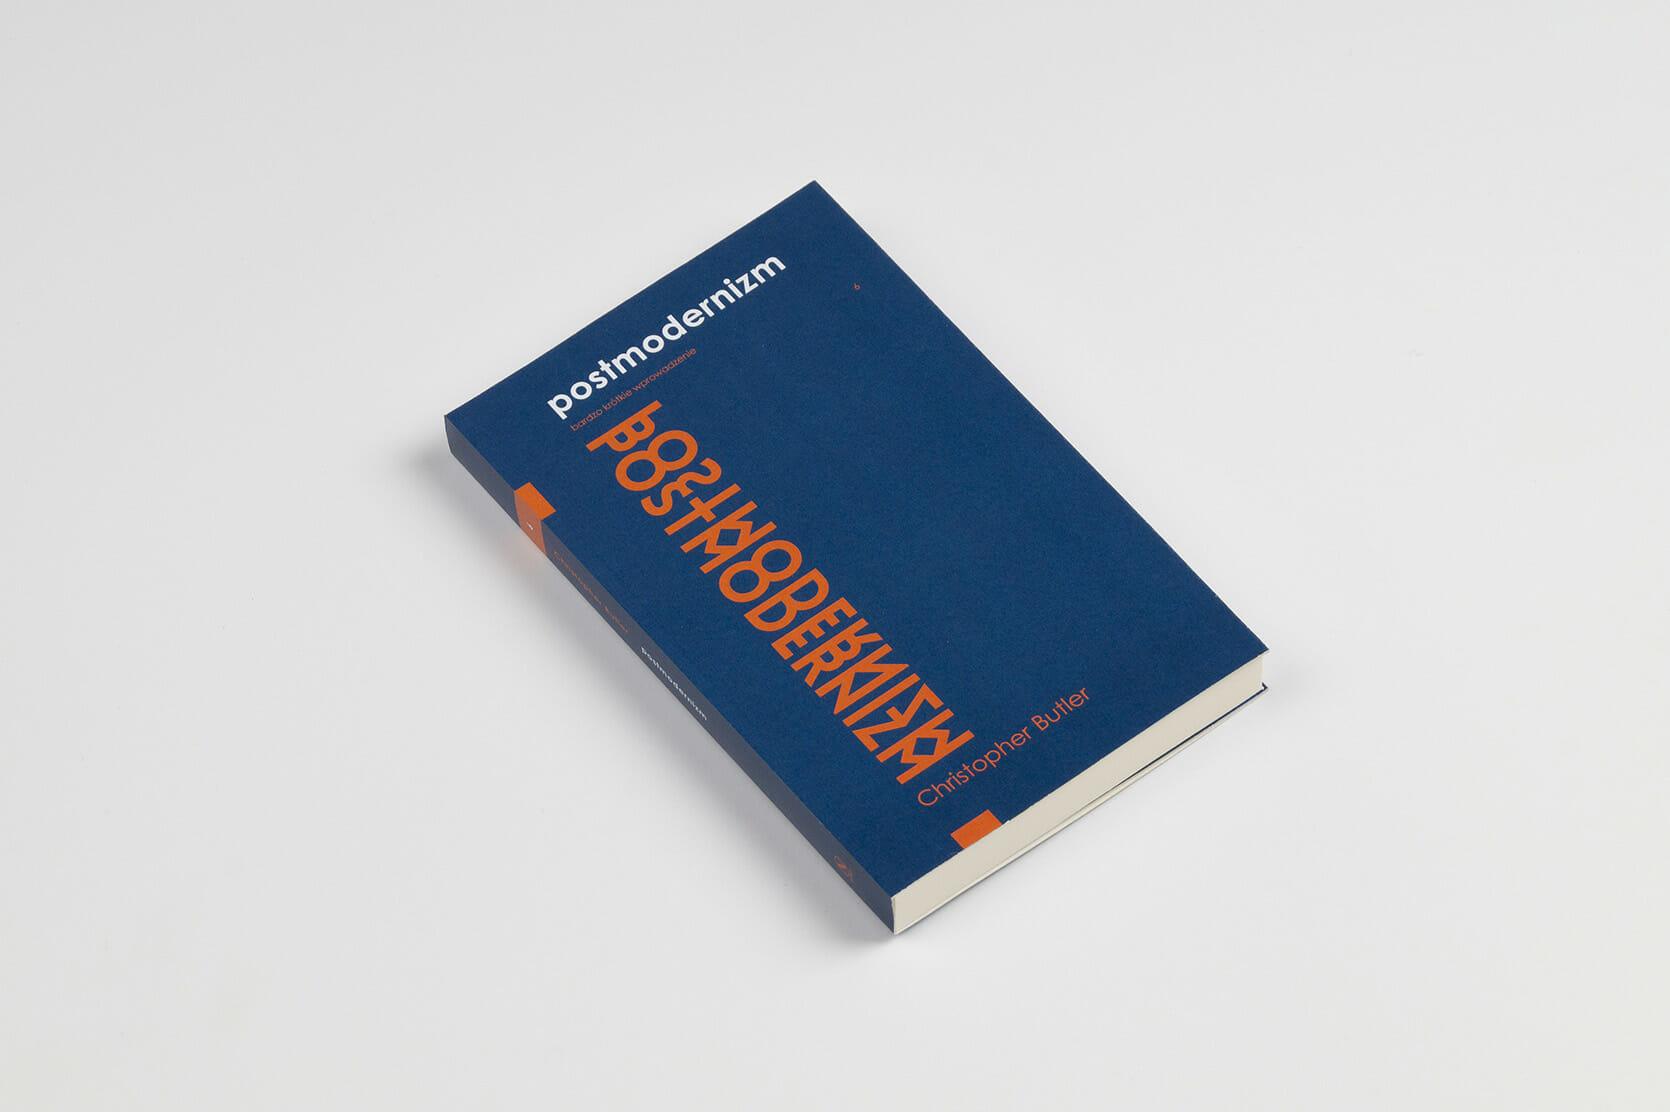 Postmodernism - book cover - butler